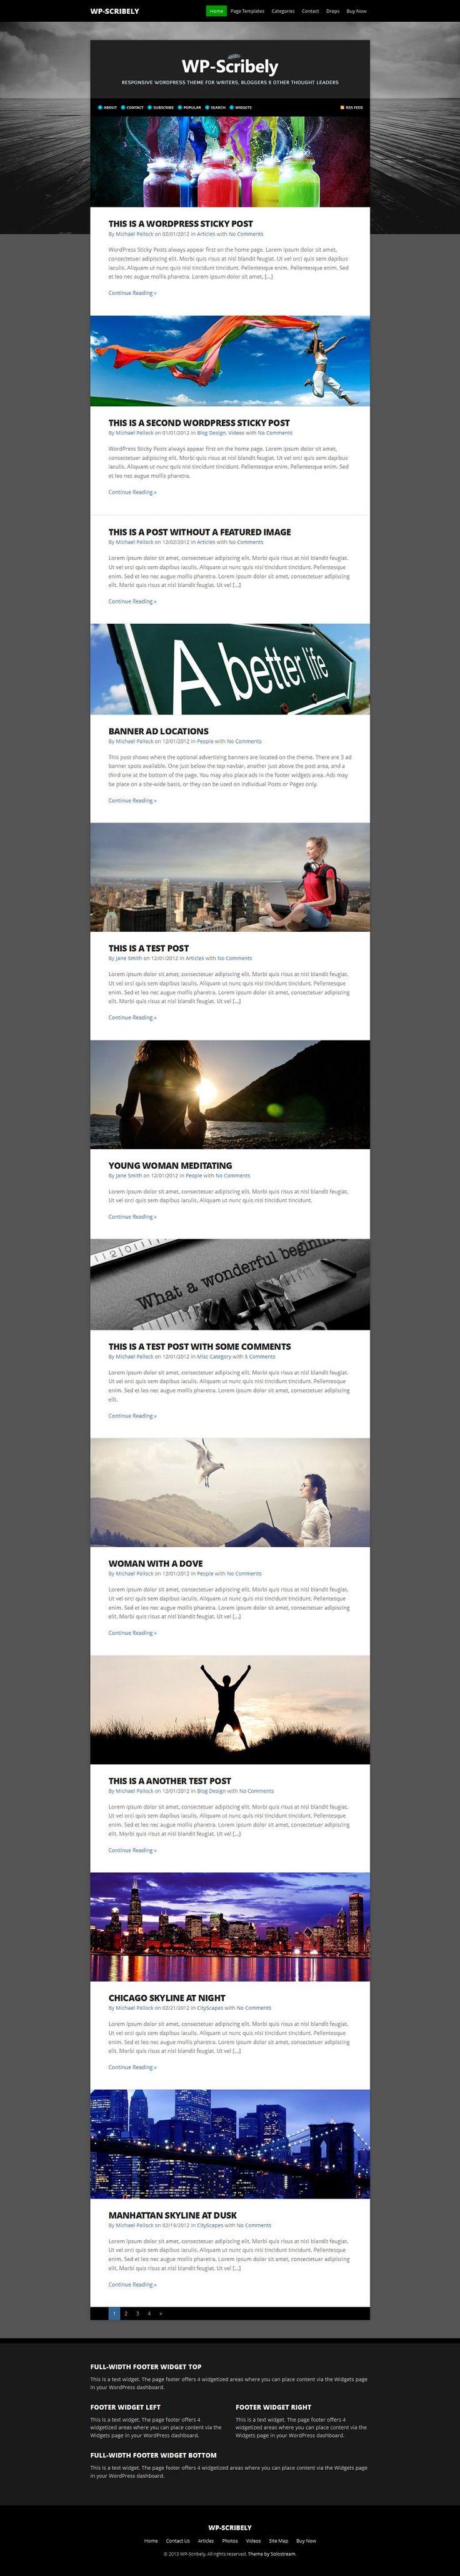 WP-Scribely: Single Column, Responsive WordPress Theme